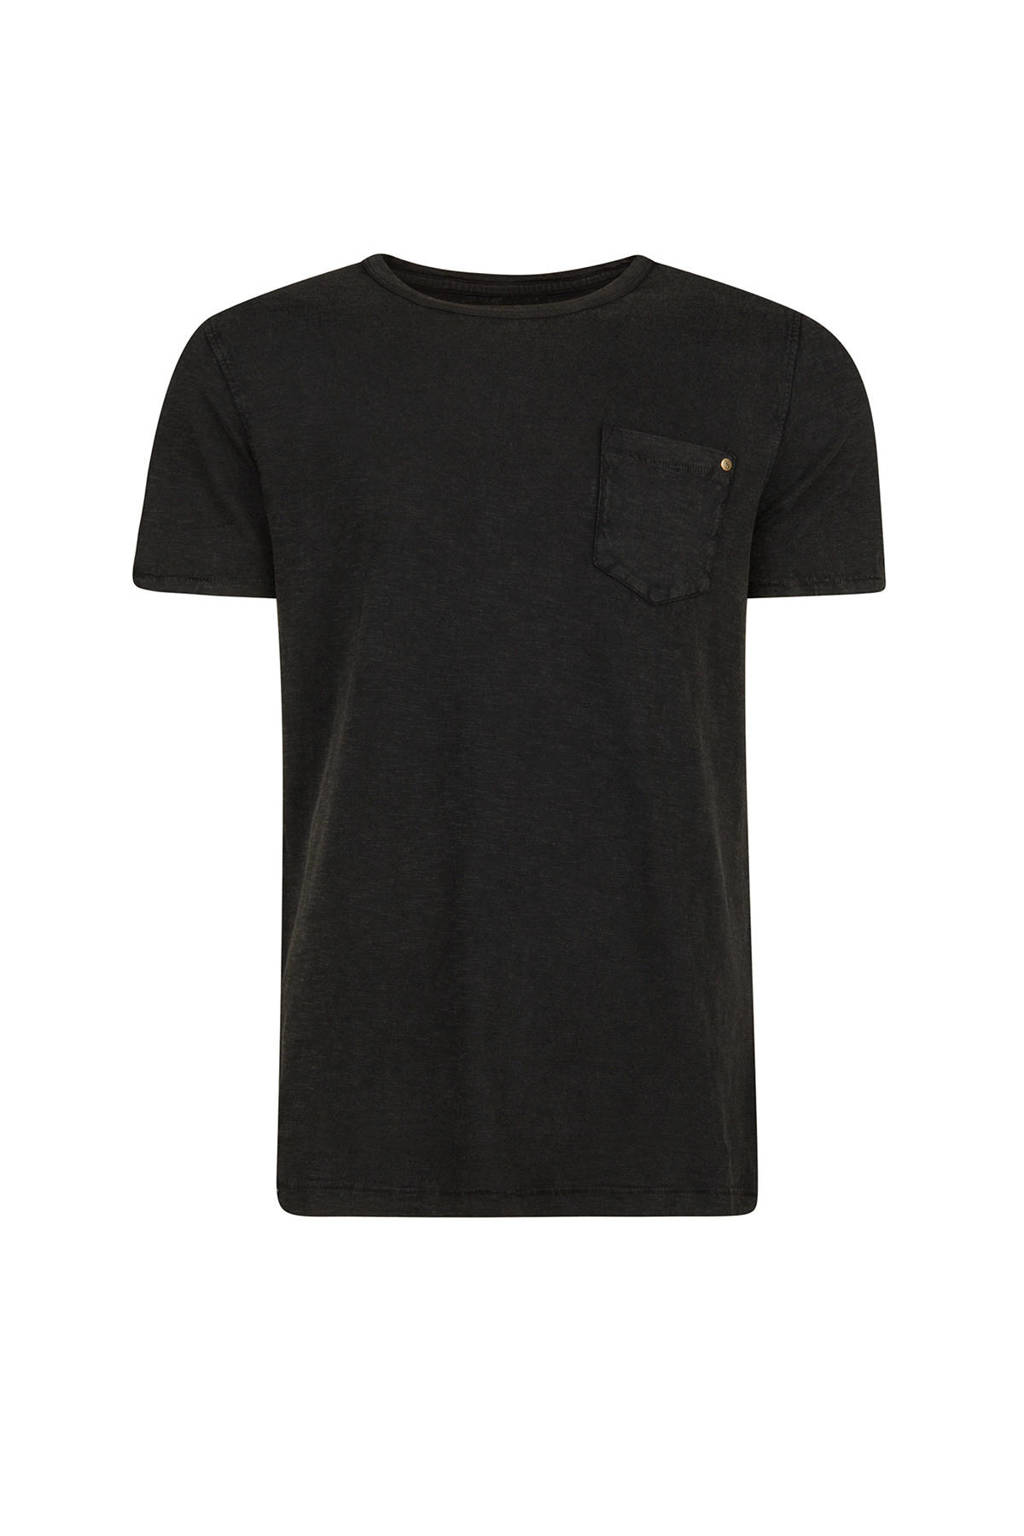 WE Fashion regular fit T-shirt, Antraciet